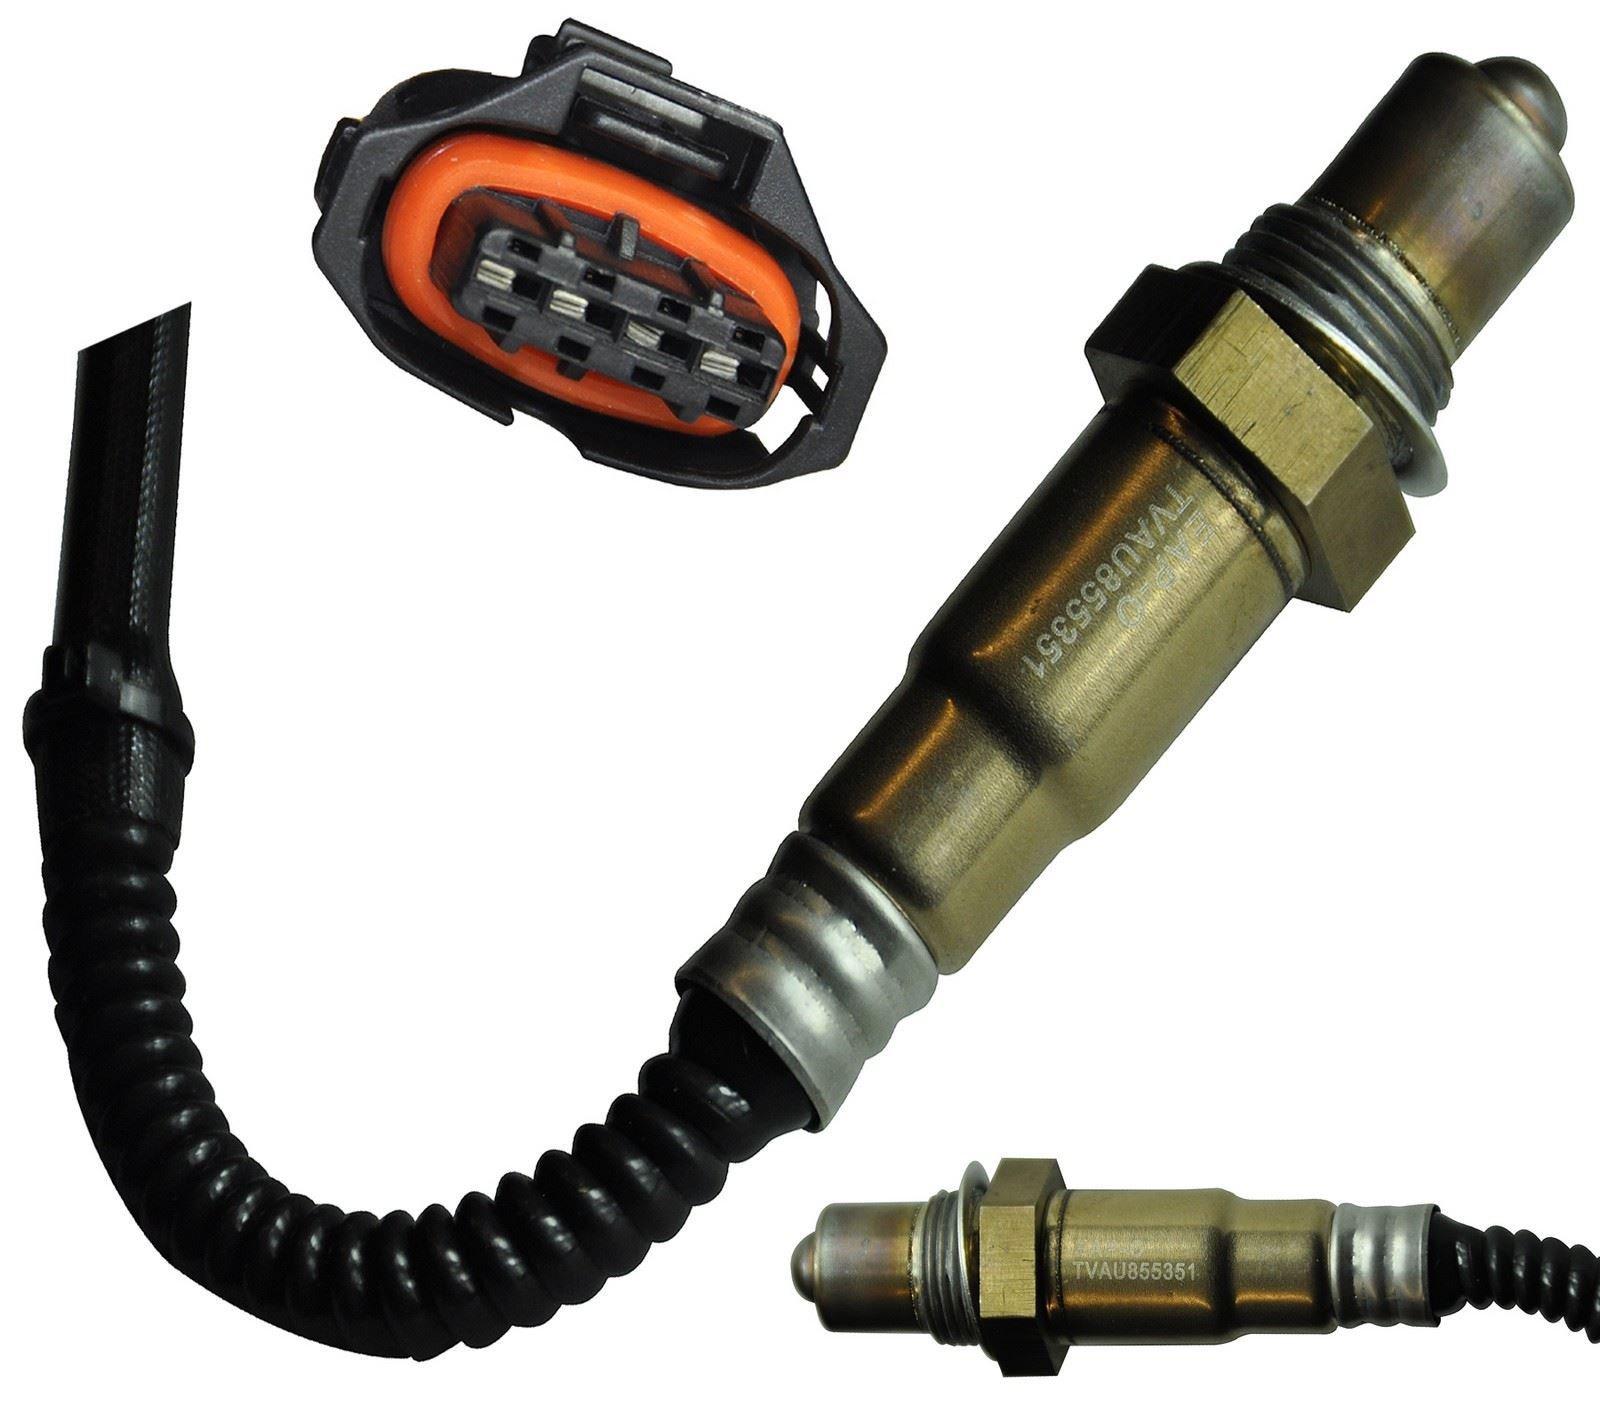 Madlife Garage Downstream Exhaust O2 Oxygen Sensor 55555625 For Astra MK5 1.4 1.6 2.0 zafira corsa